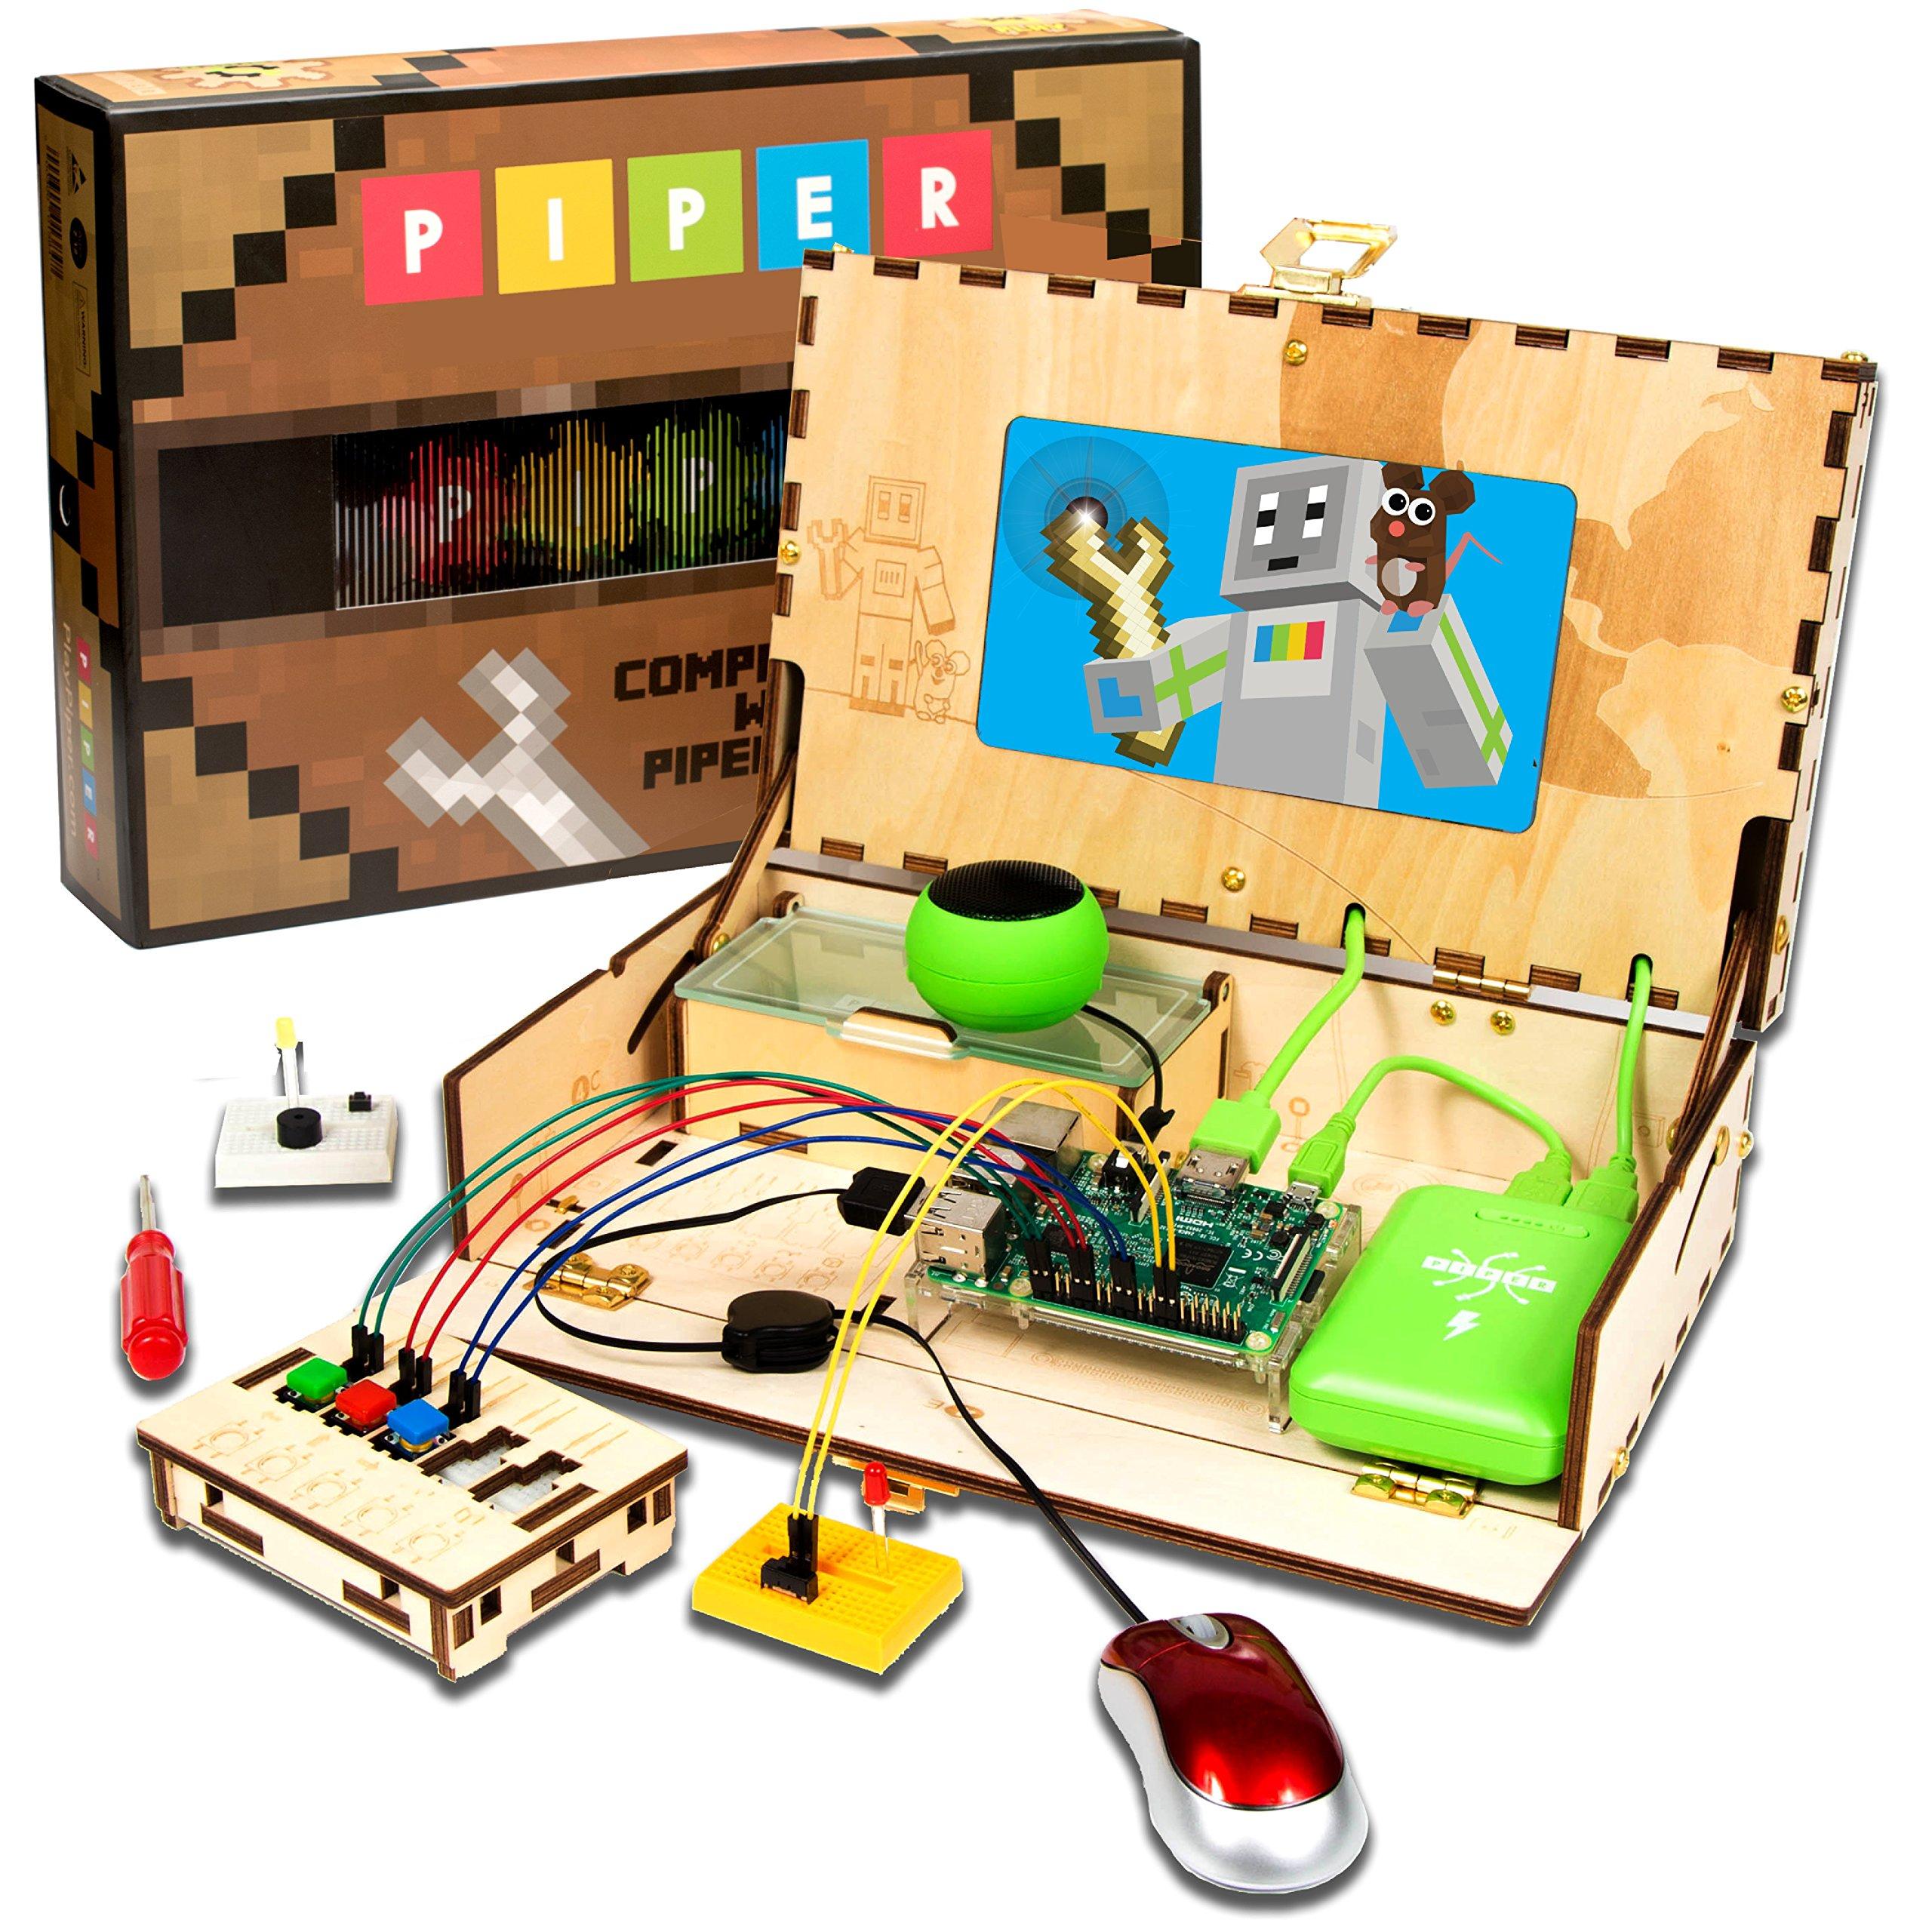 Buy Stem Computer Kit Now!